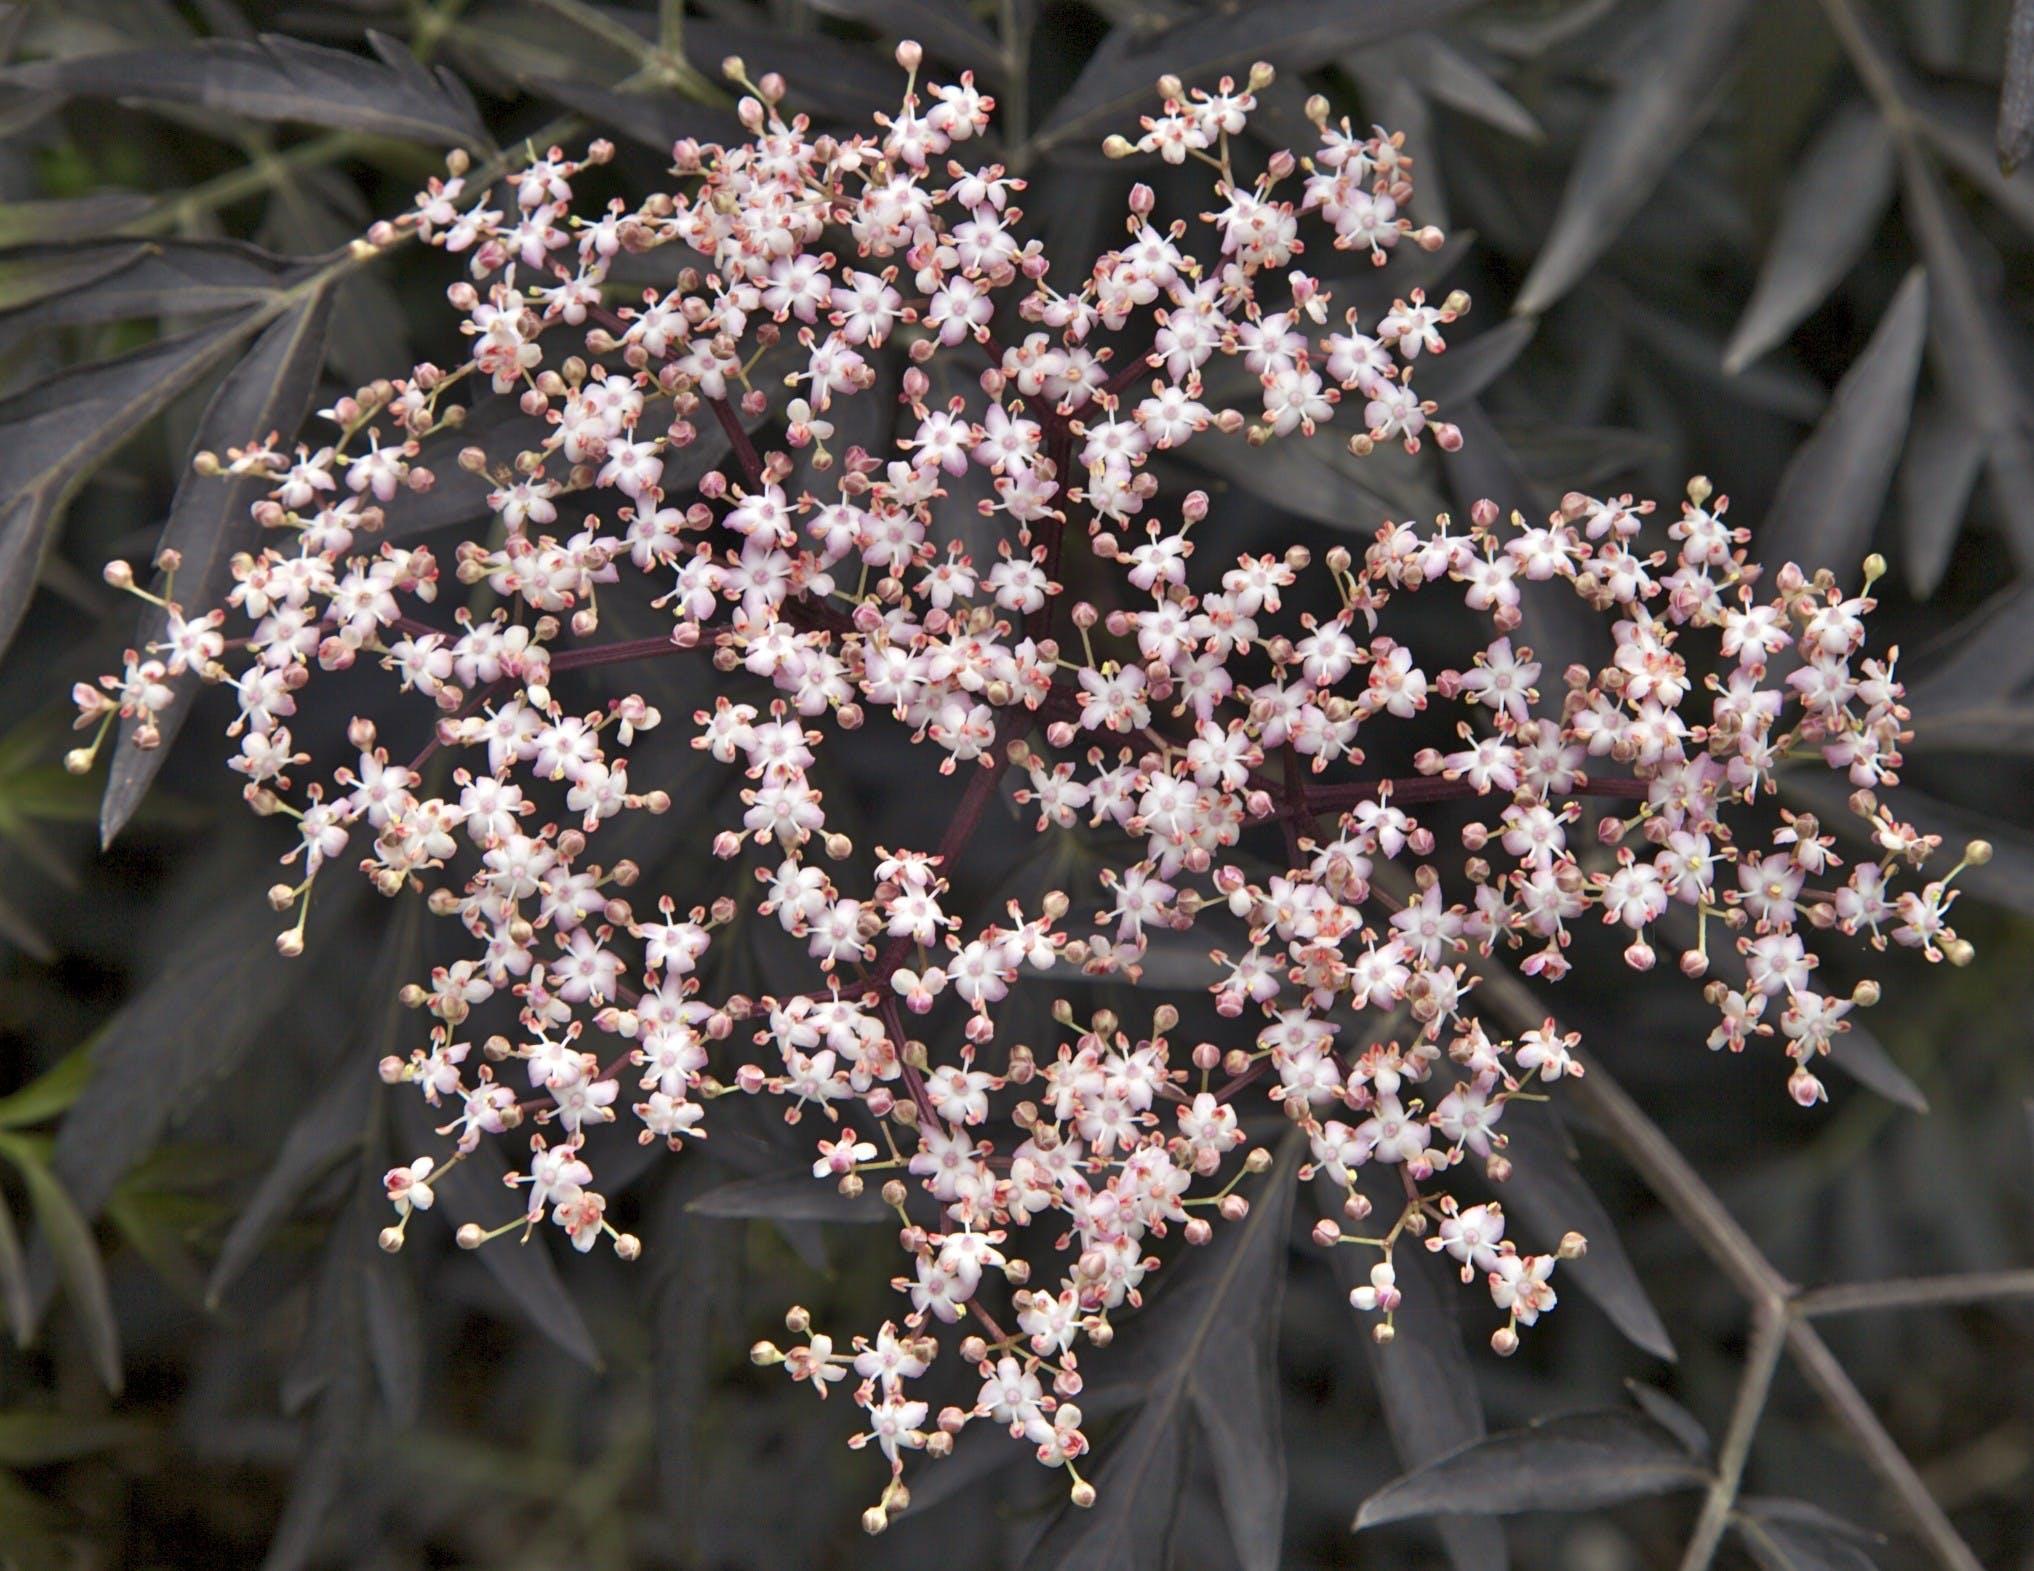 Rødbladet hyld (sambucus nigra)